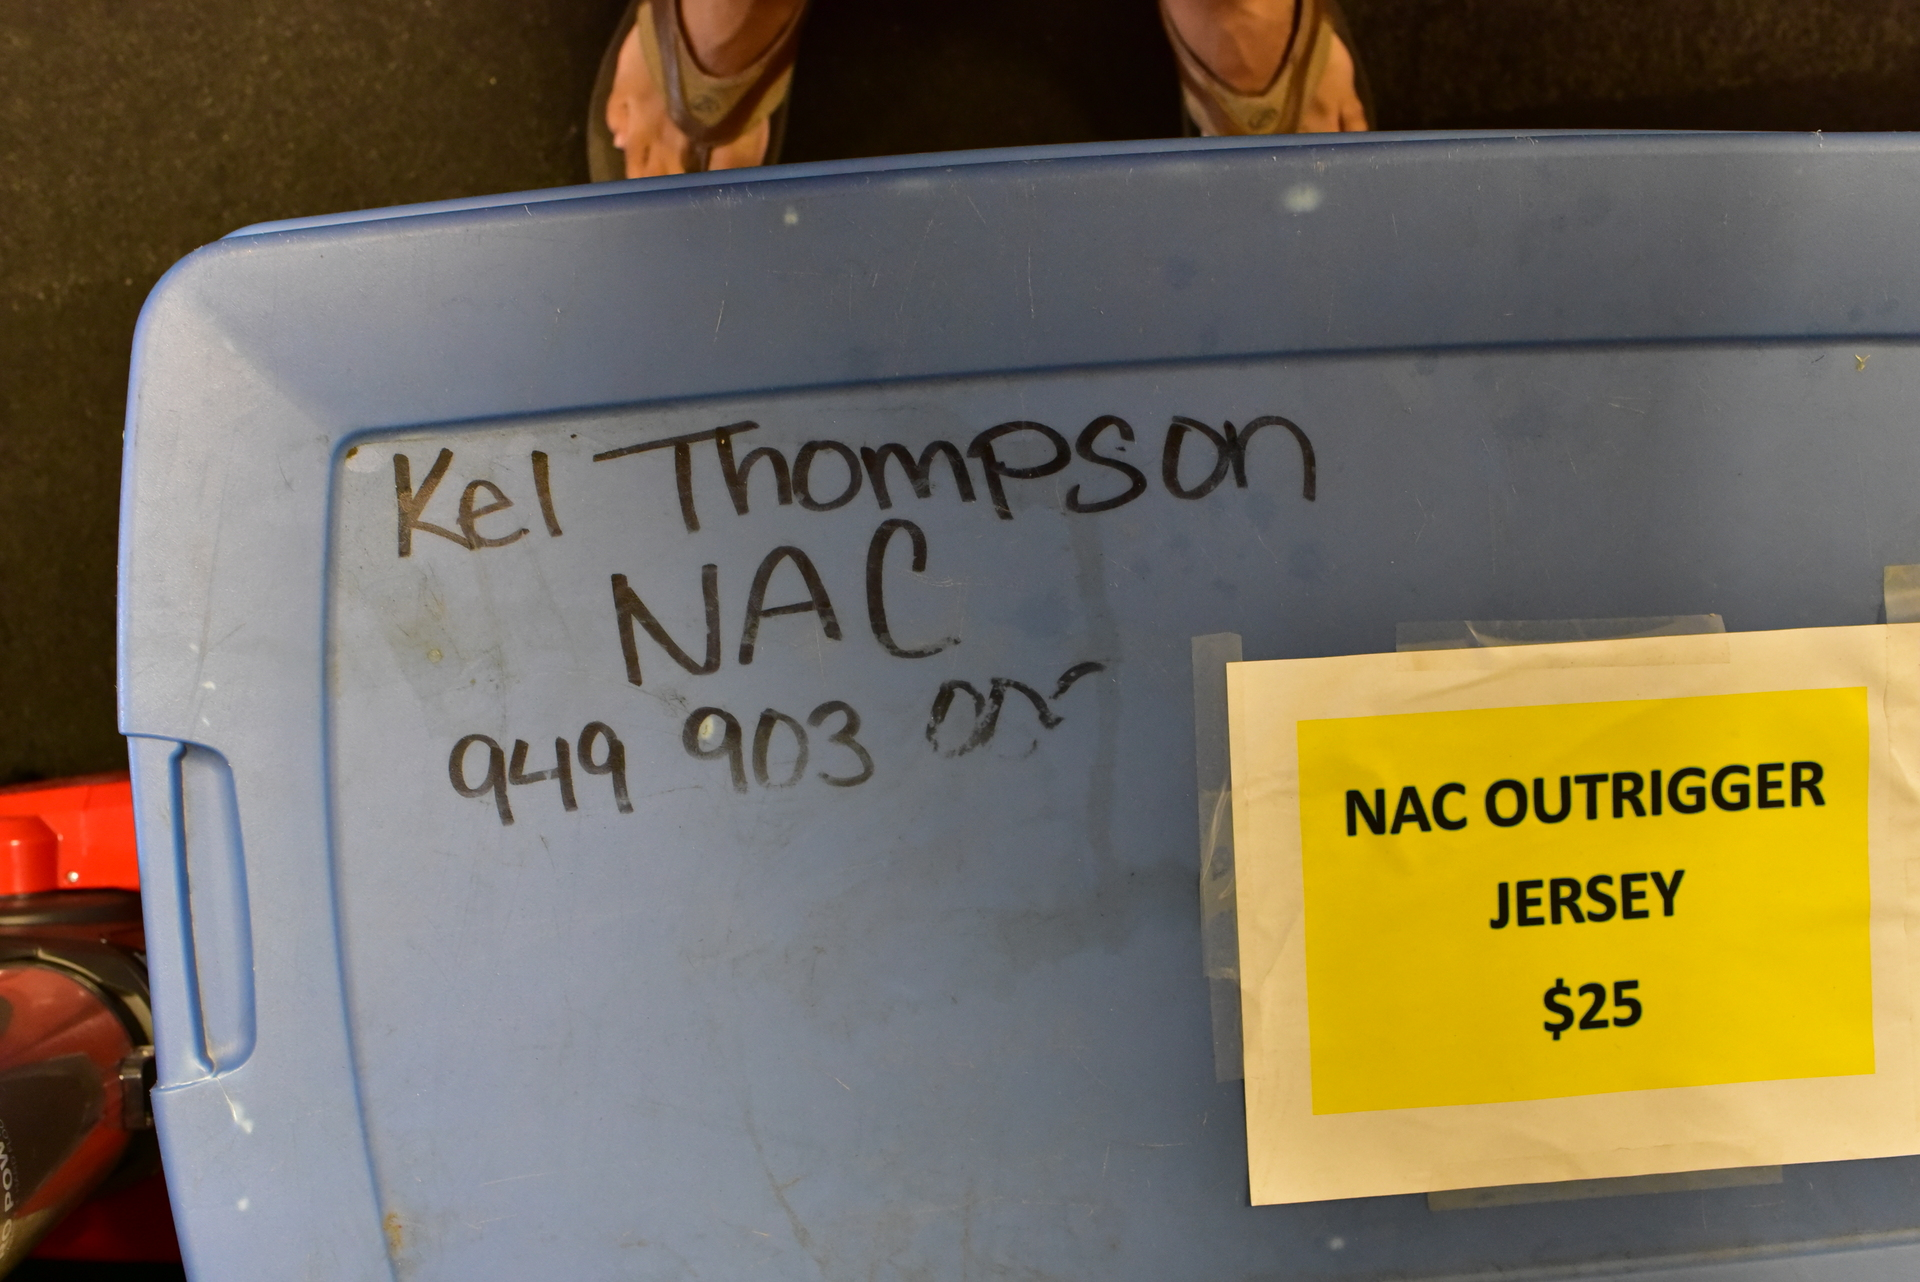 plastic storage tub with Kelly Thompson's name on it